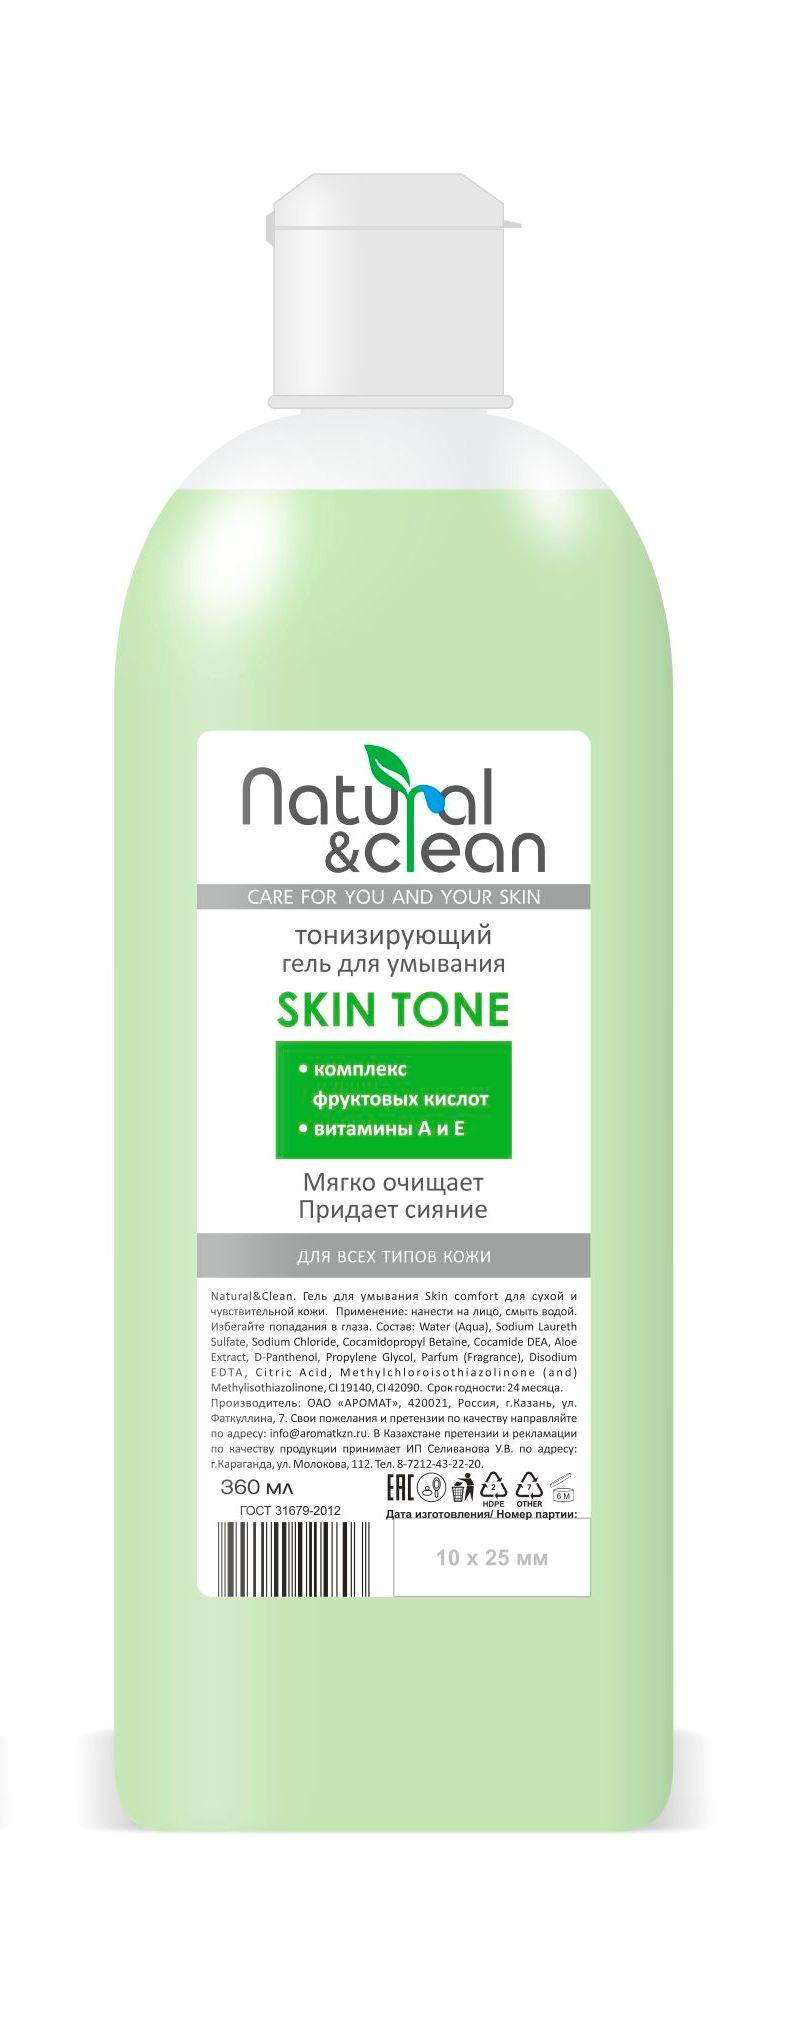 Гель для умывания NATURAL&CLEANТонизирующий Skin Tone для всех типов кожи, 360 мл NATURAL&CLEAN